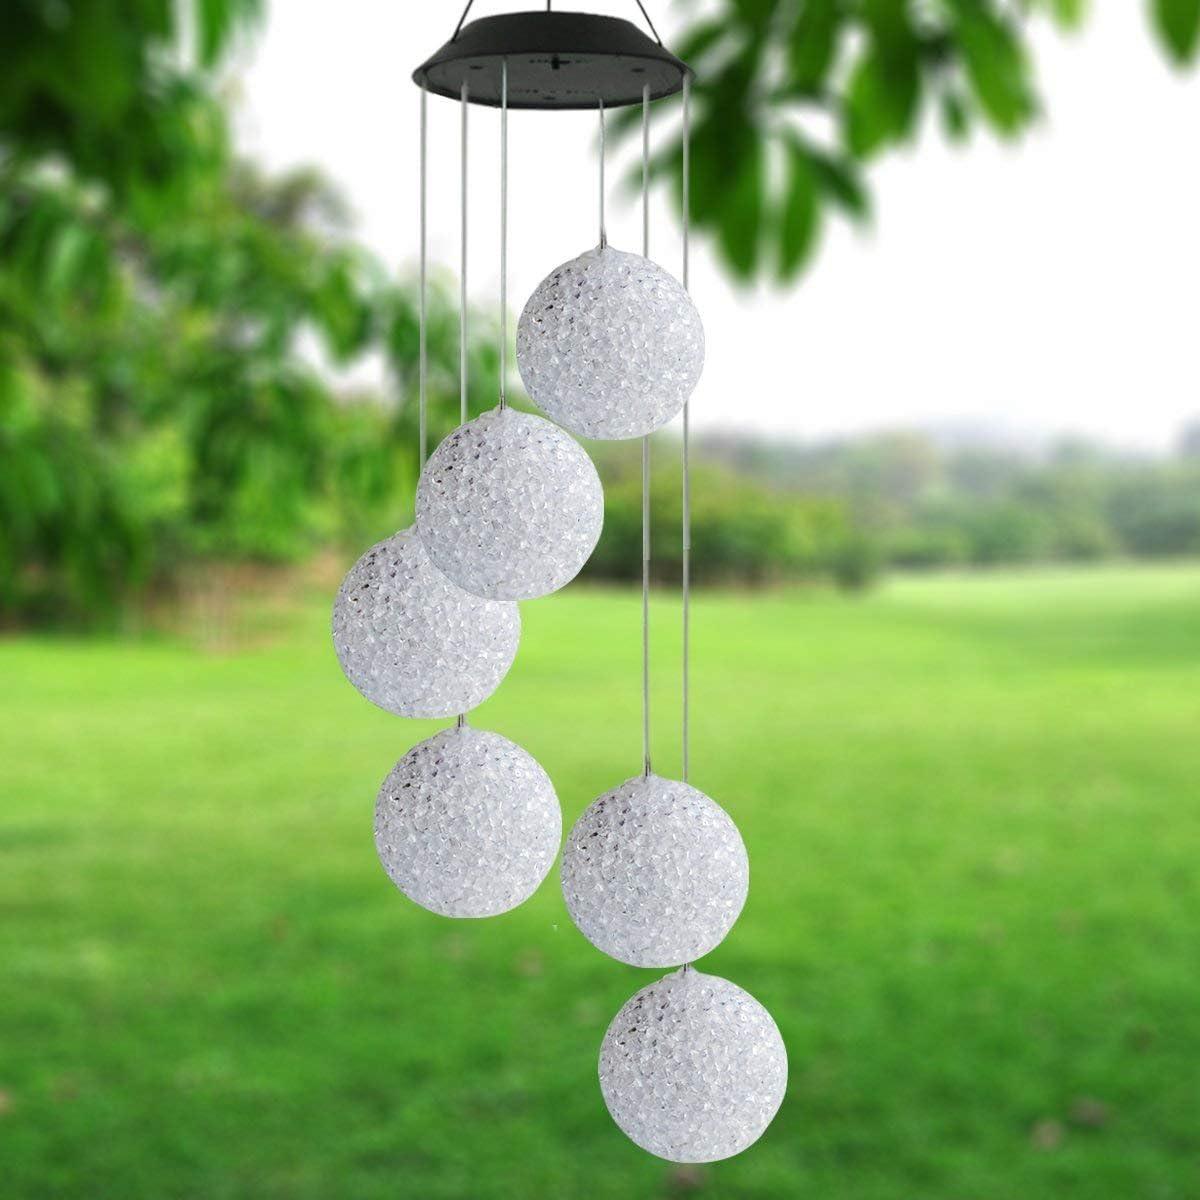 Yooda - Campana de viento solar con bola de cristal LED que cambia de color, para exteriores, impermeable, con energía solar, para patio, jardín, ...